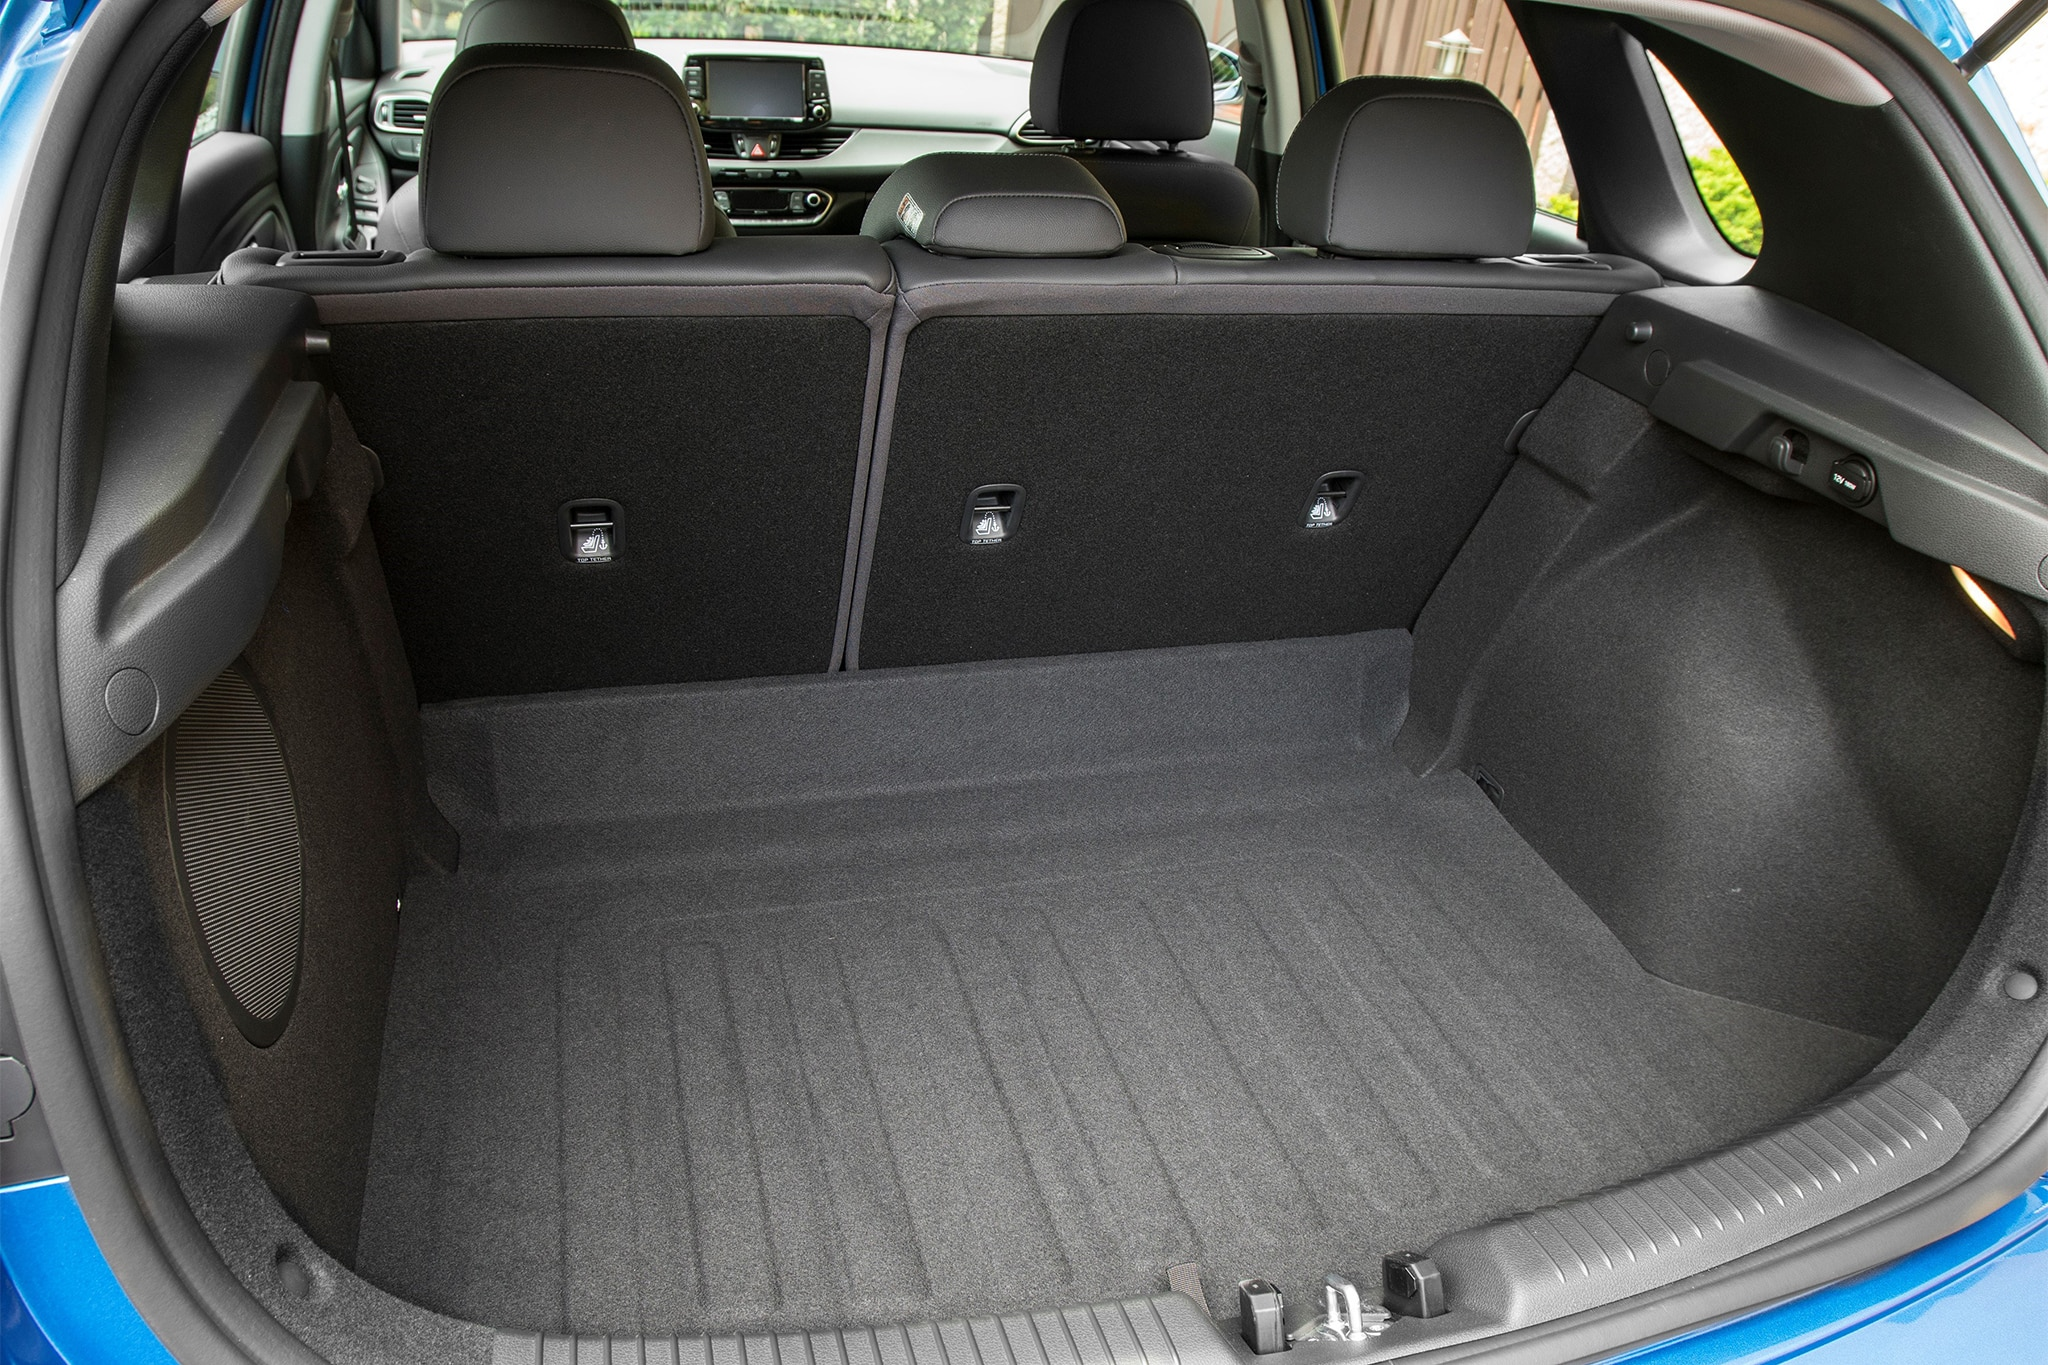 2018 hyundai elantra gt sport cargo space 01 motor trend en espa ol. Black Bedroom Furniture Sets. Home Design Ideas